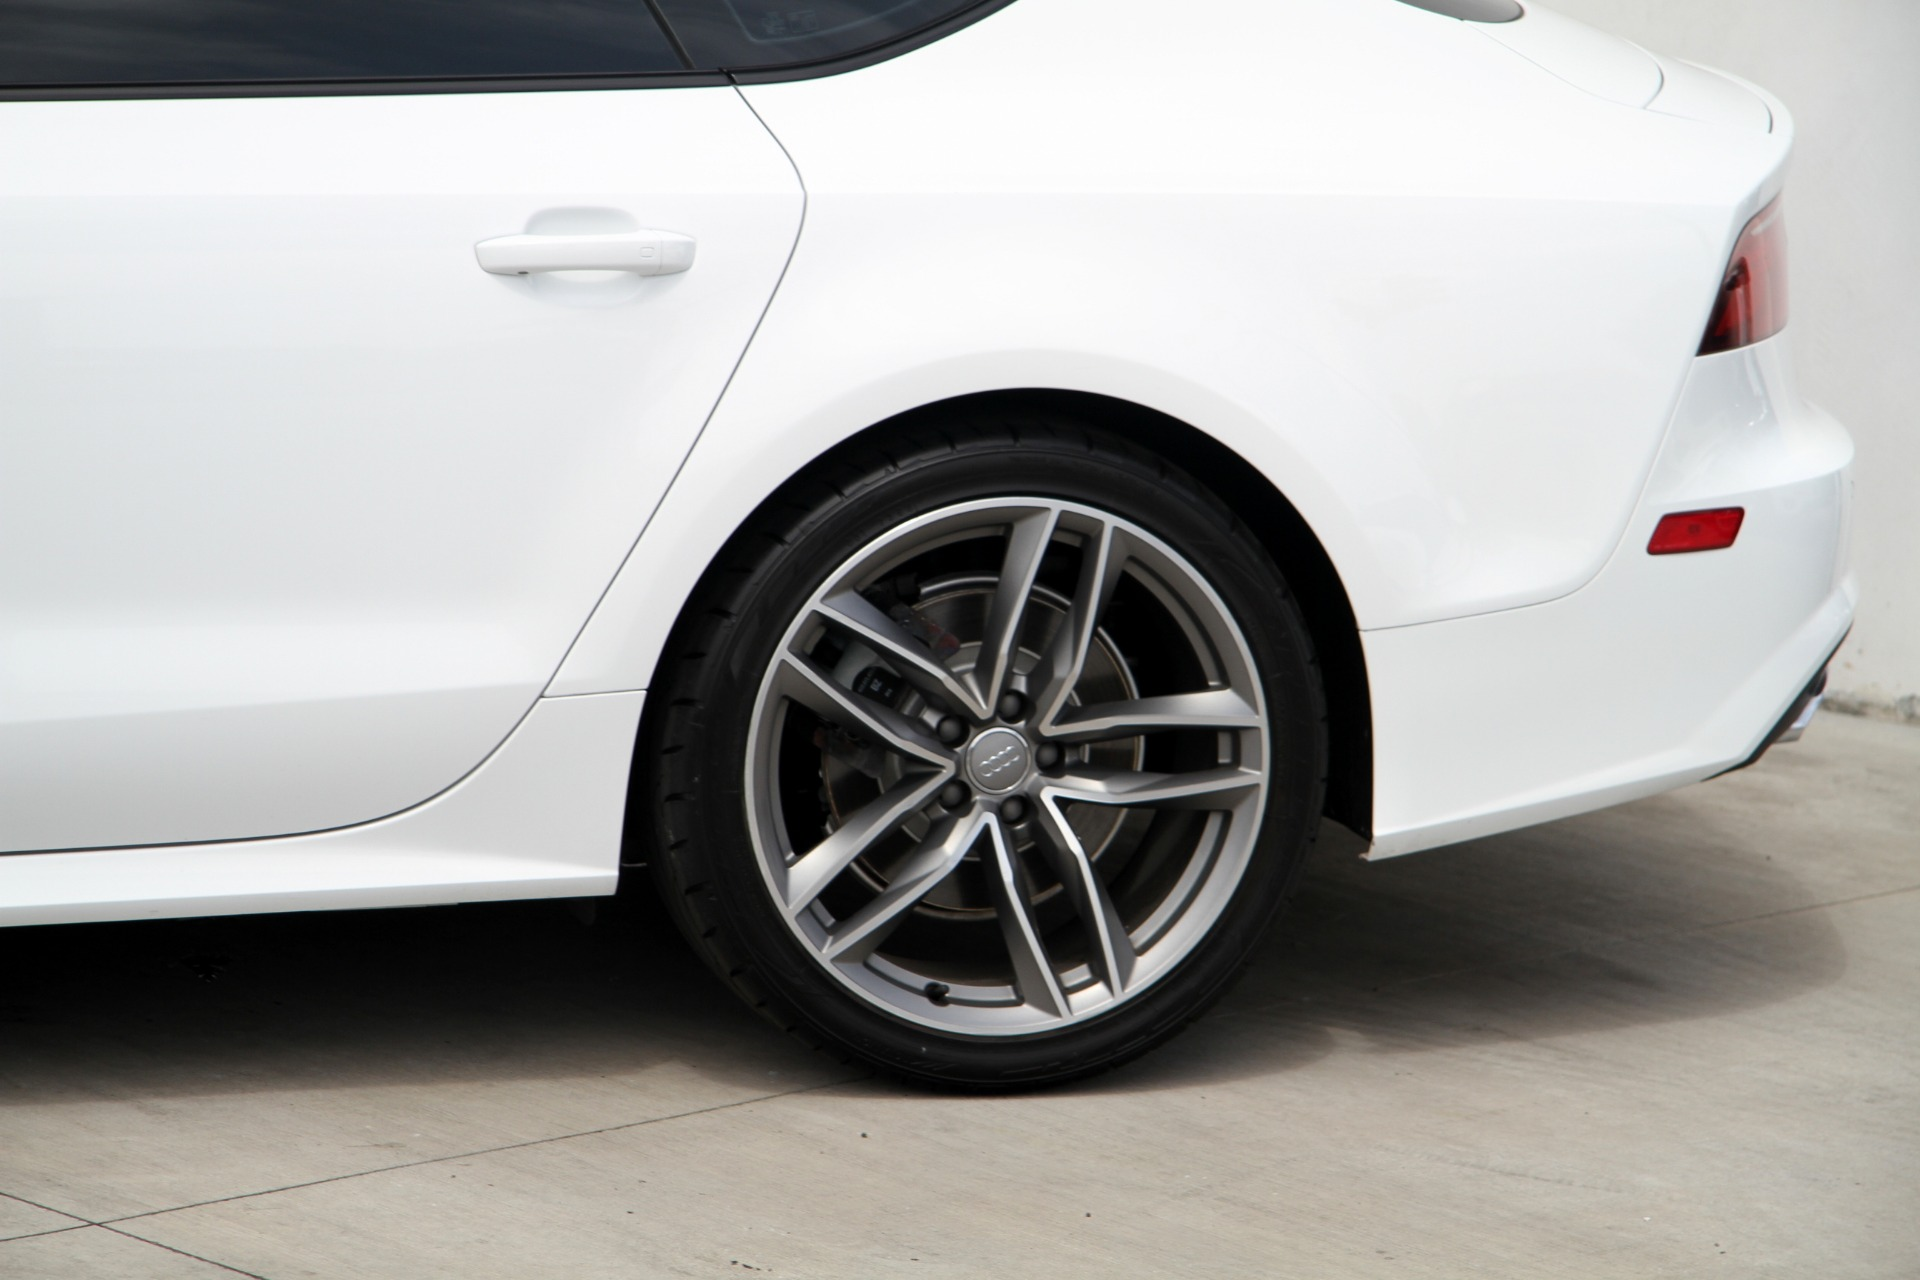 Used Audi For Sale Near Me >> 2016 Audi A7 3.0T quattro Premium Plus ***S LINE SPORT PKG ...